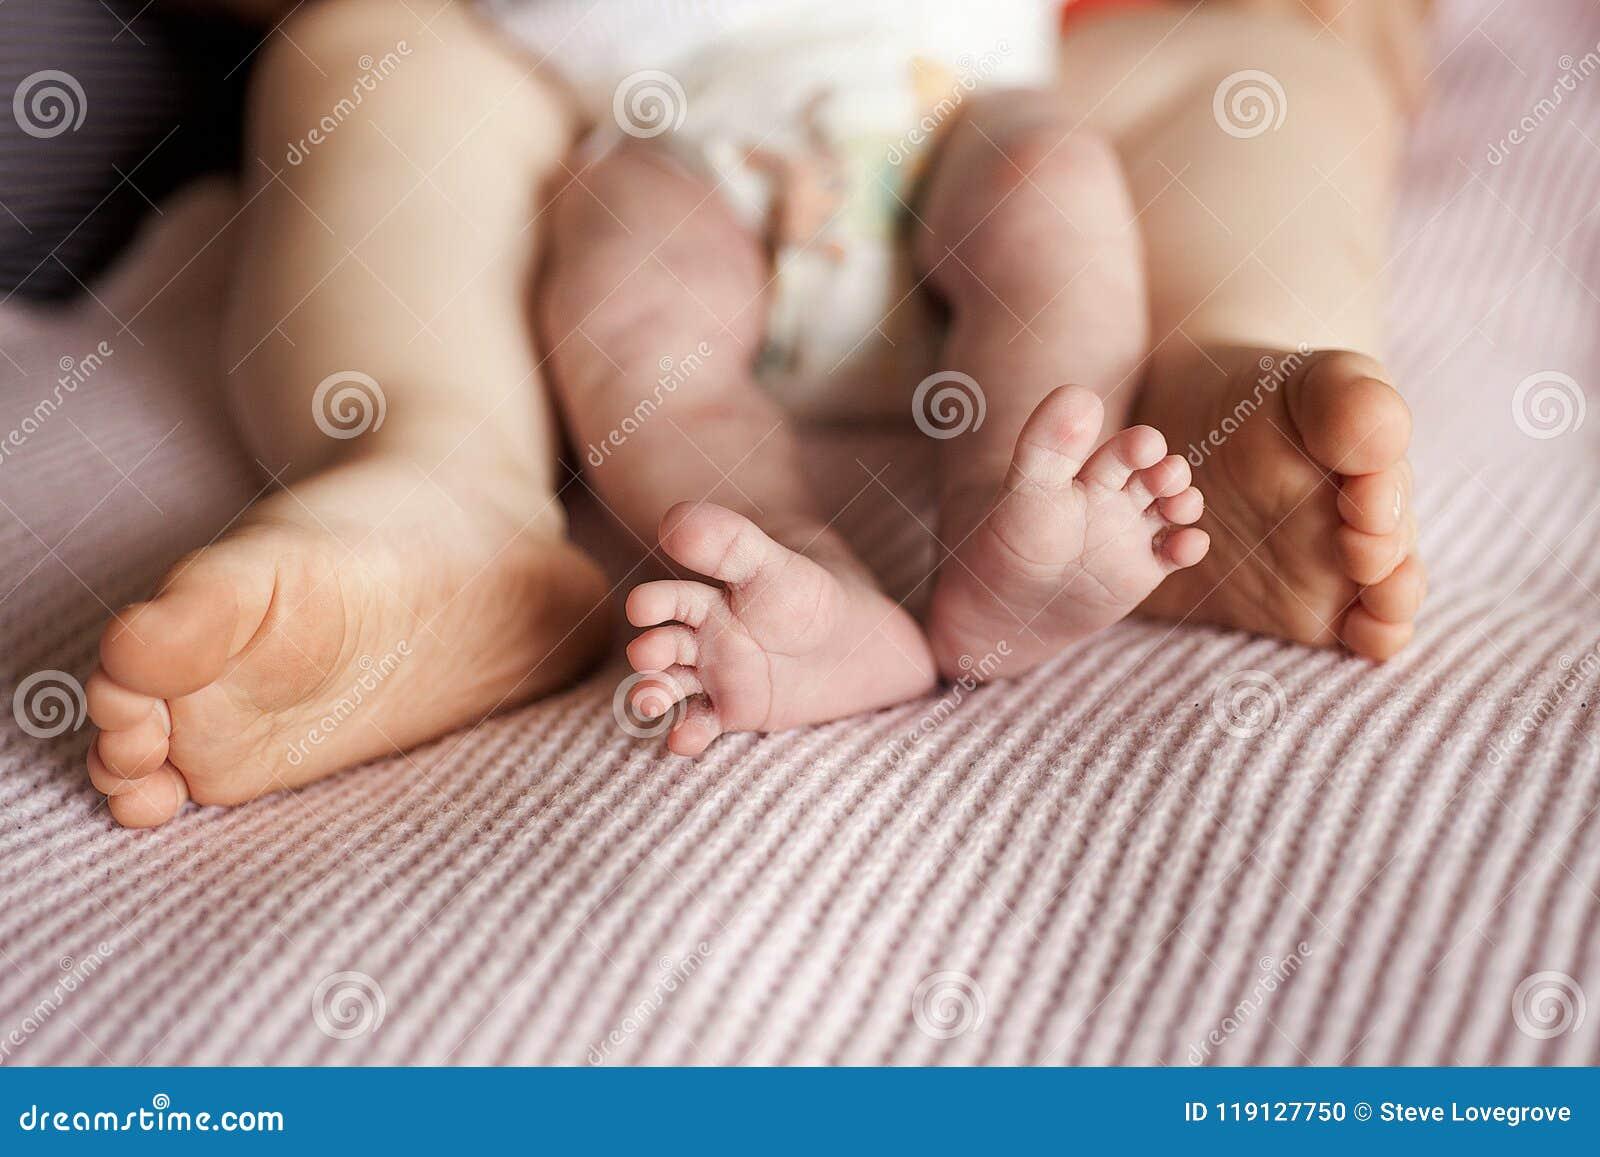 Close Up Detail Of Newborn Baby Boys Feet